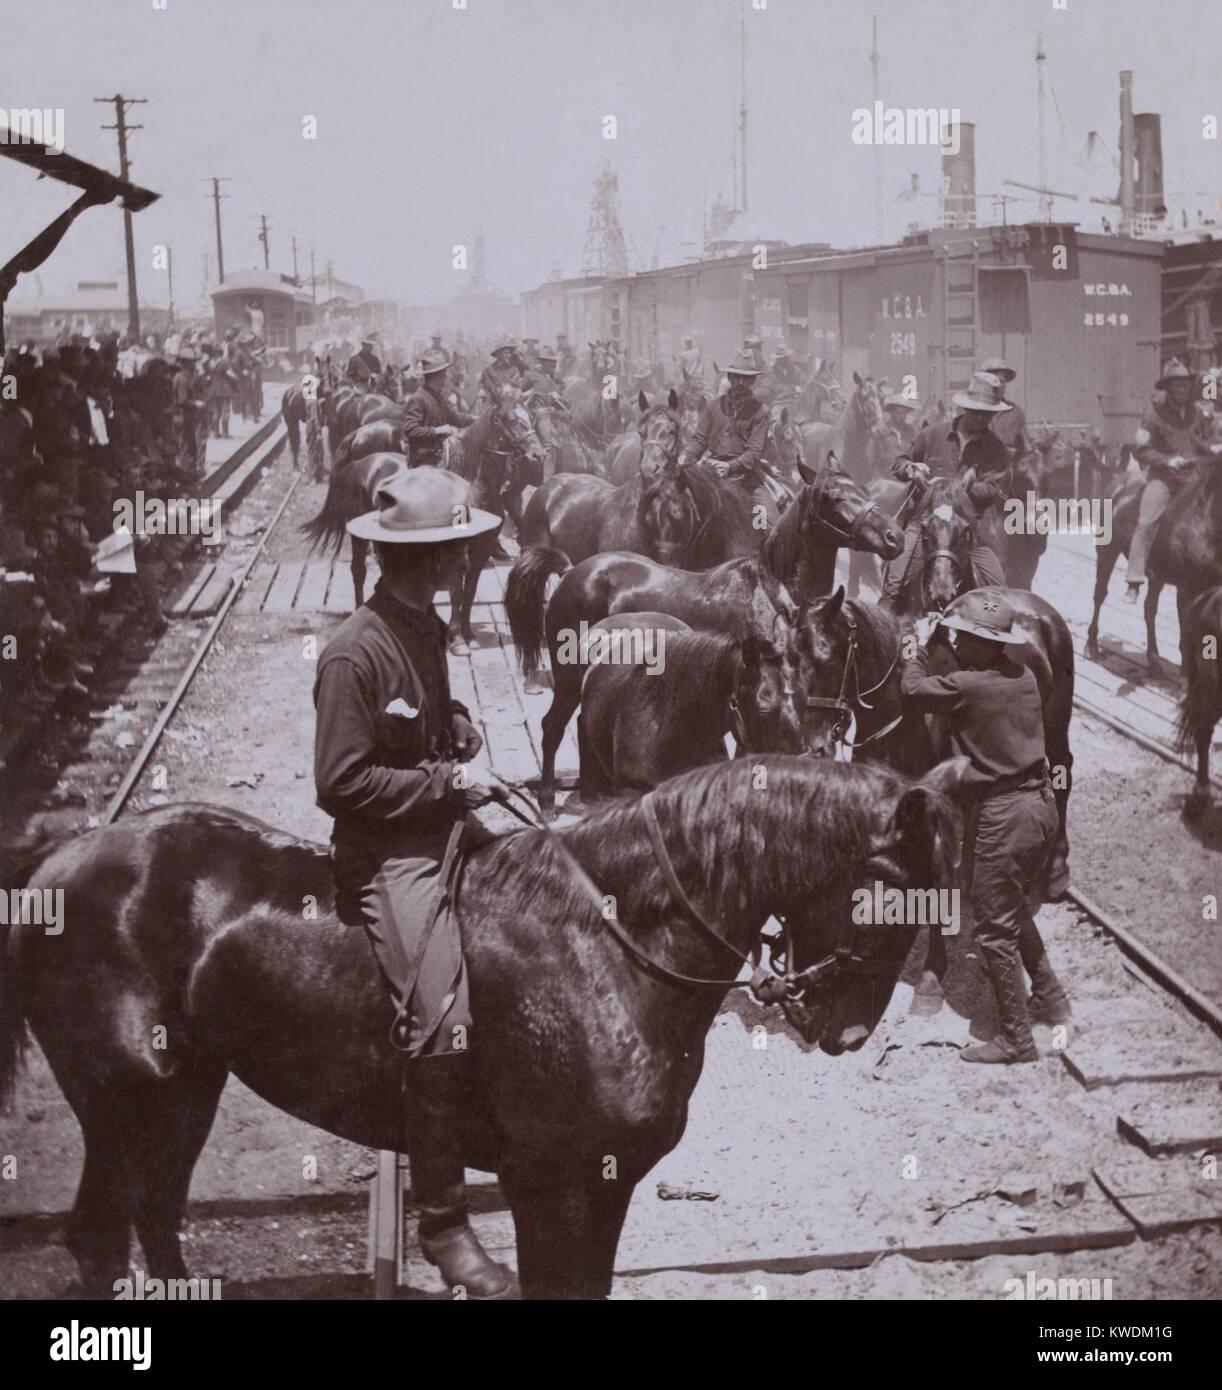 United States Cavalry - Wikipedia